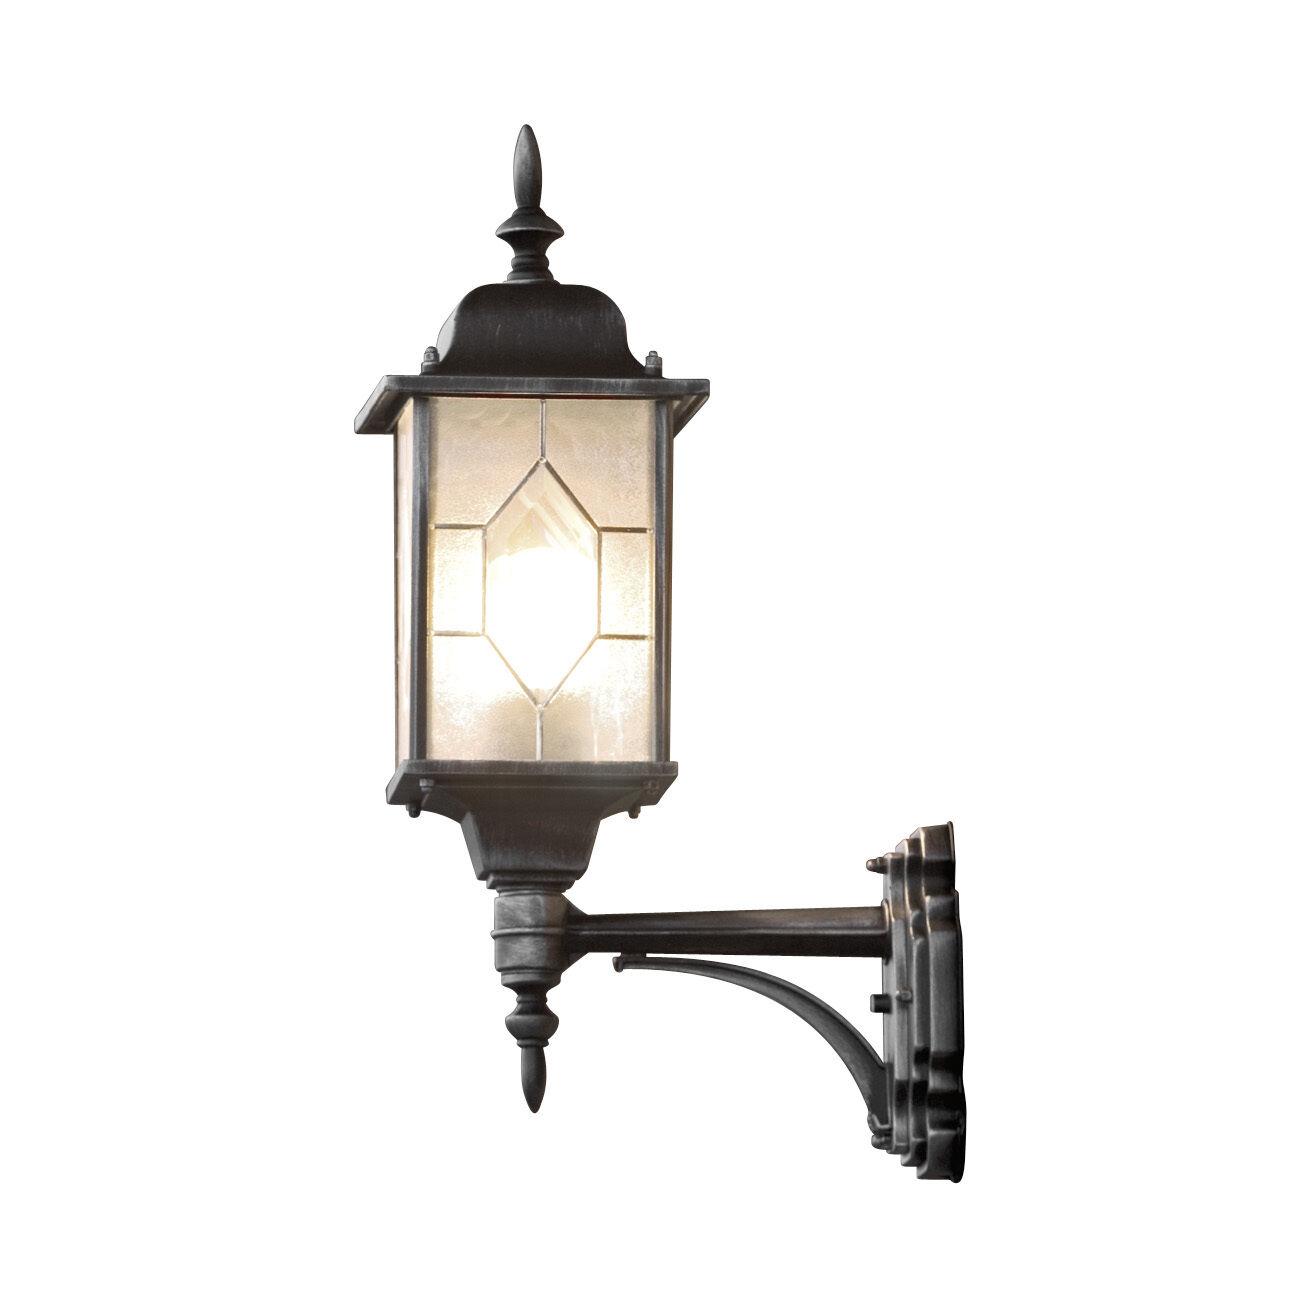 Large Ornate Leaded Lantern Wall Light Outdoor 4 Sided schwarz Leaded Opaque